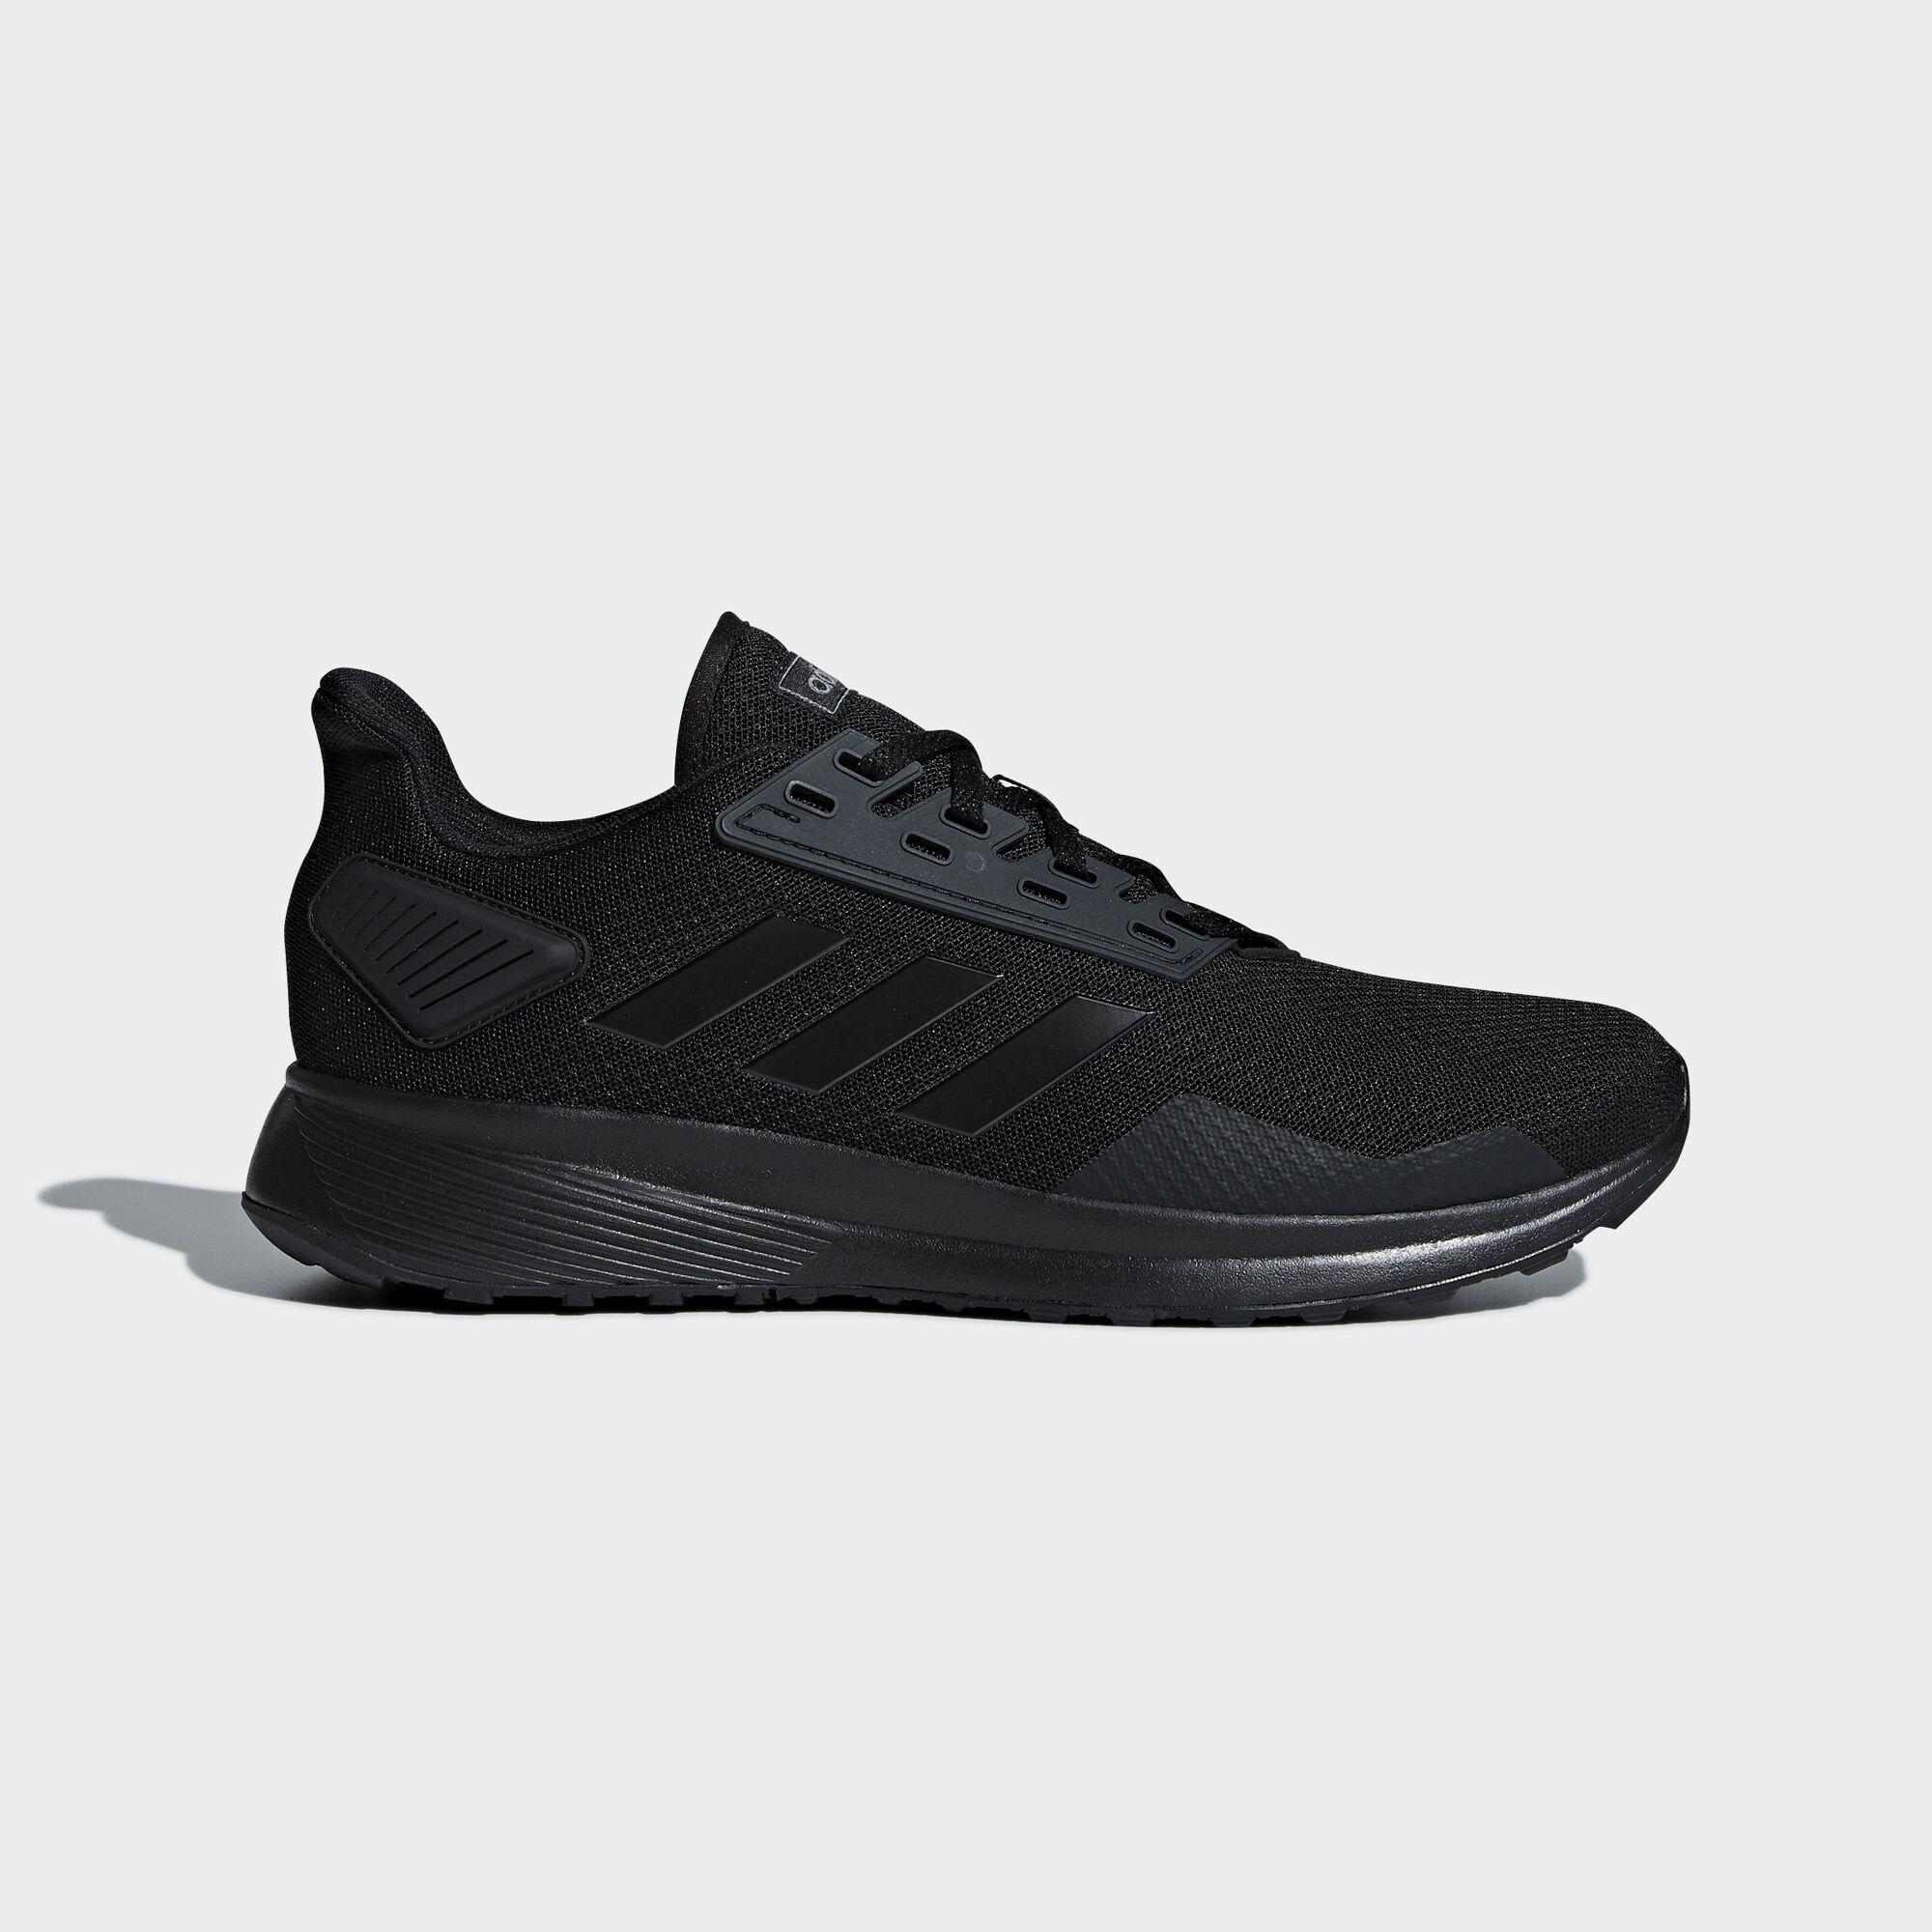 new style 1efaf ac510 adidas - Duramo 9 Shoes Core Black  Core Black  Core Black B96578